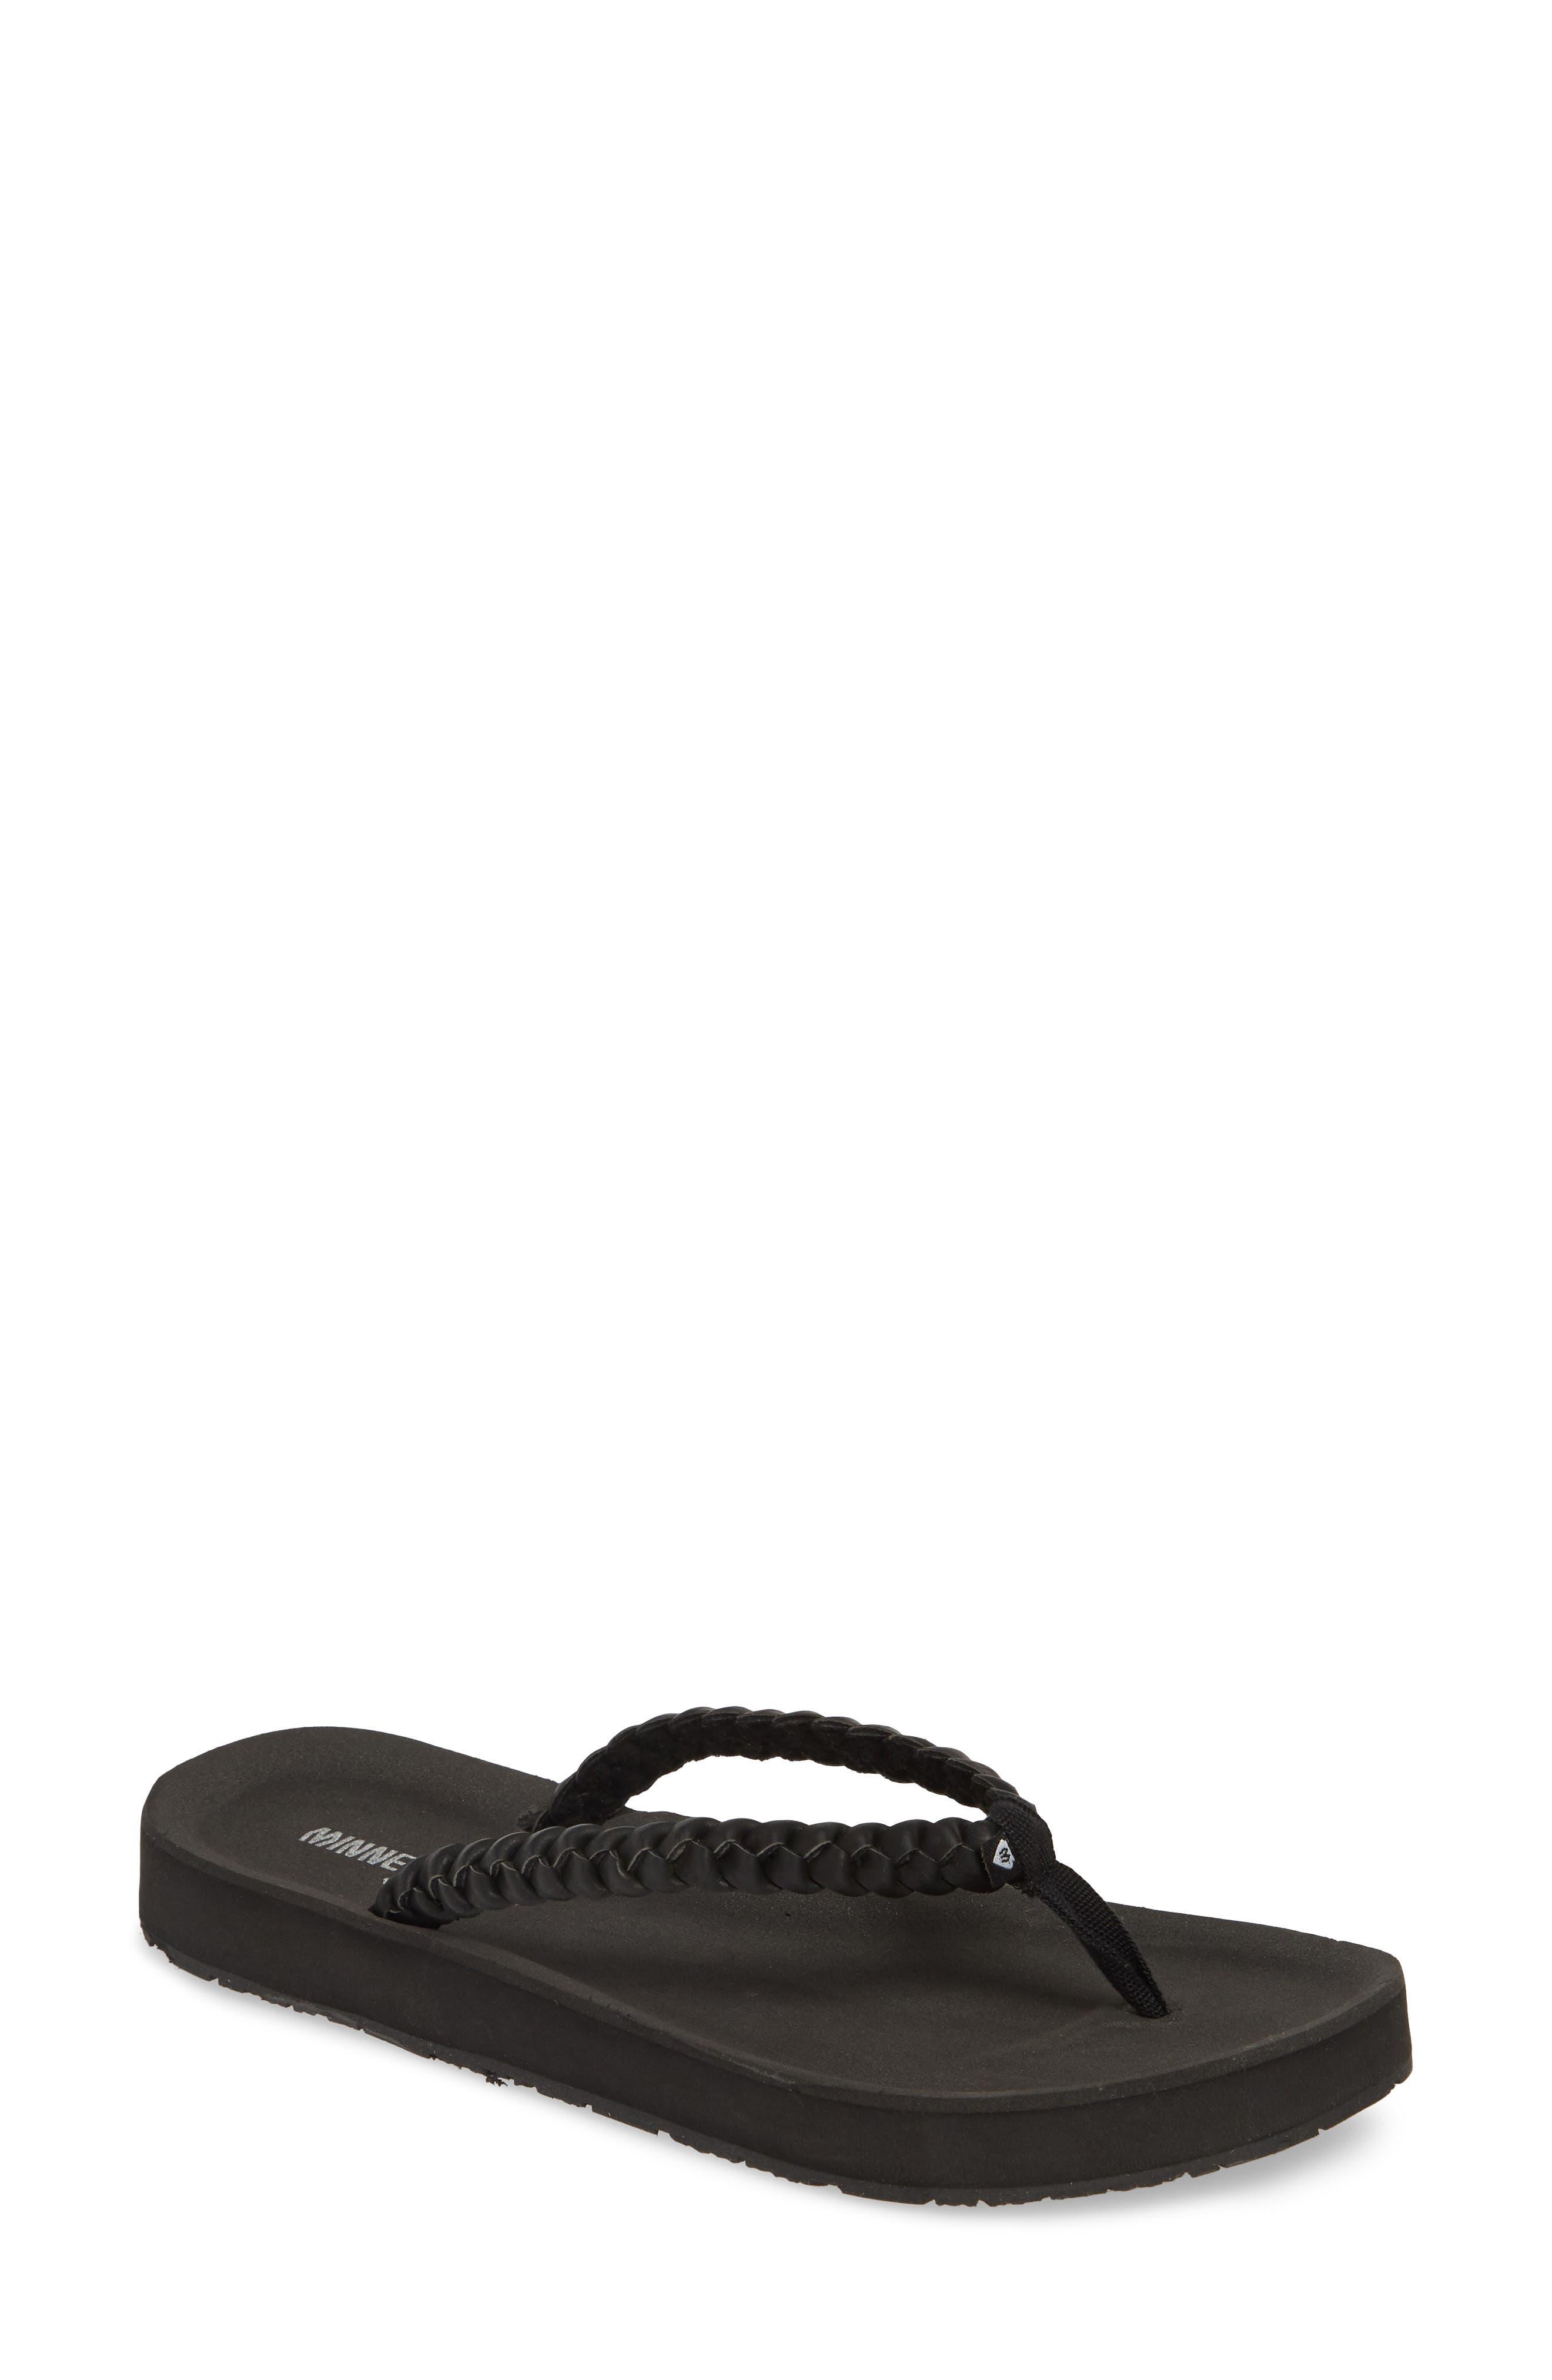 MINNETONKA Hallie Flip Flop, Main, color, BLACK